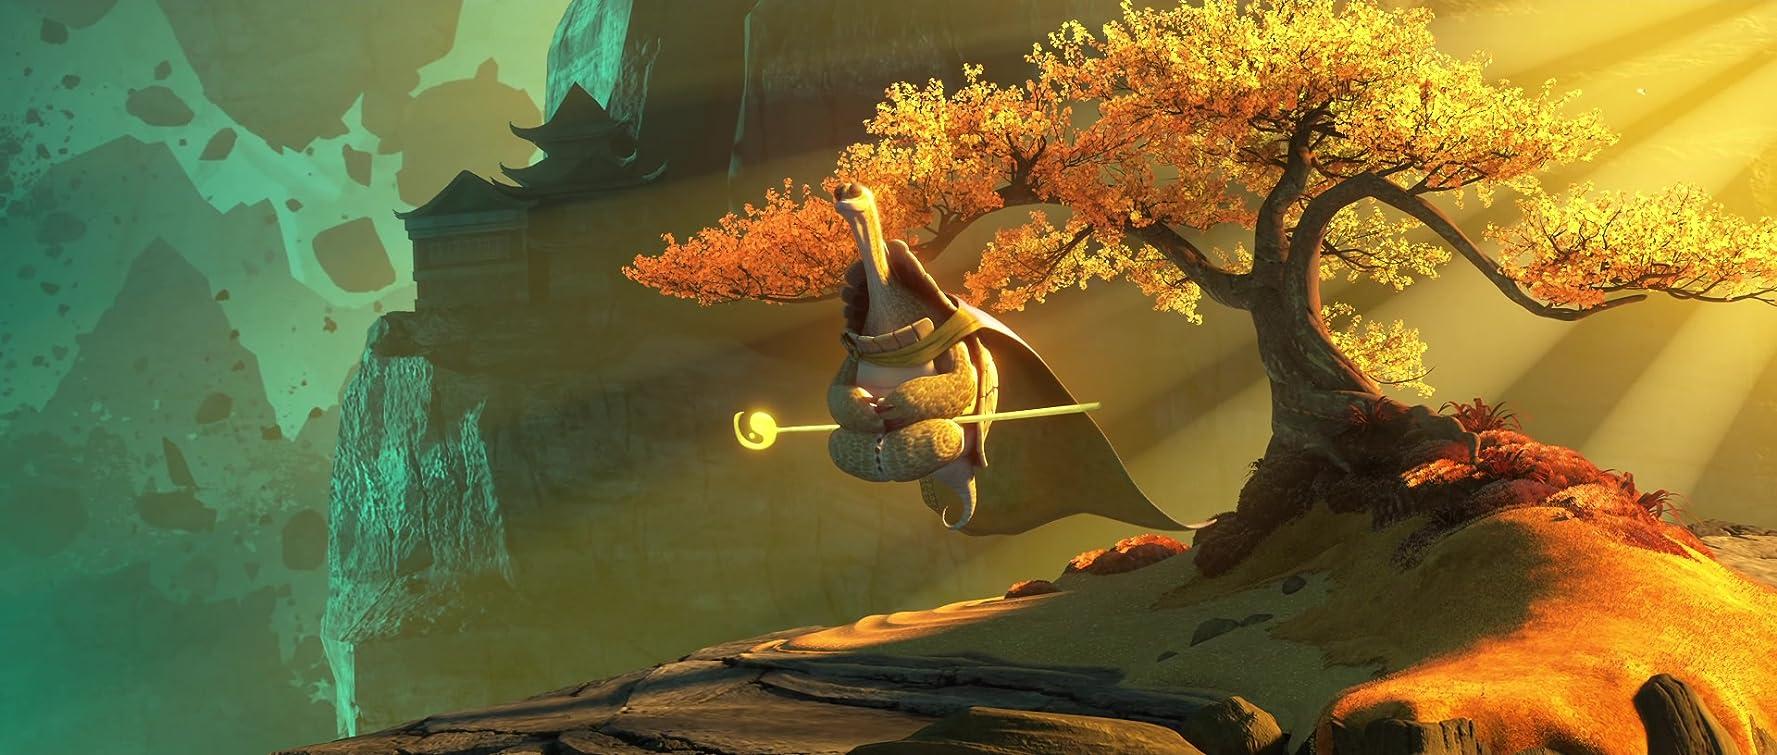 Randall Duk Kim in Kung Fu Panda 3 (2016)